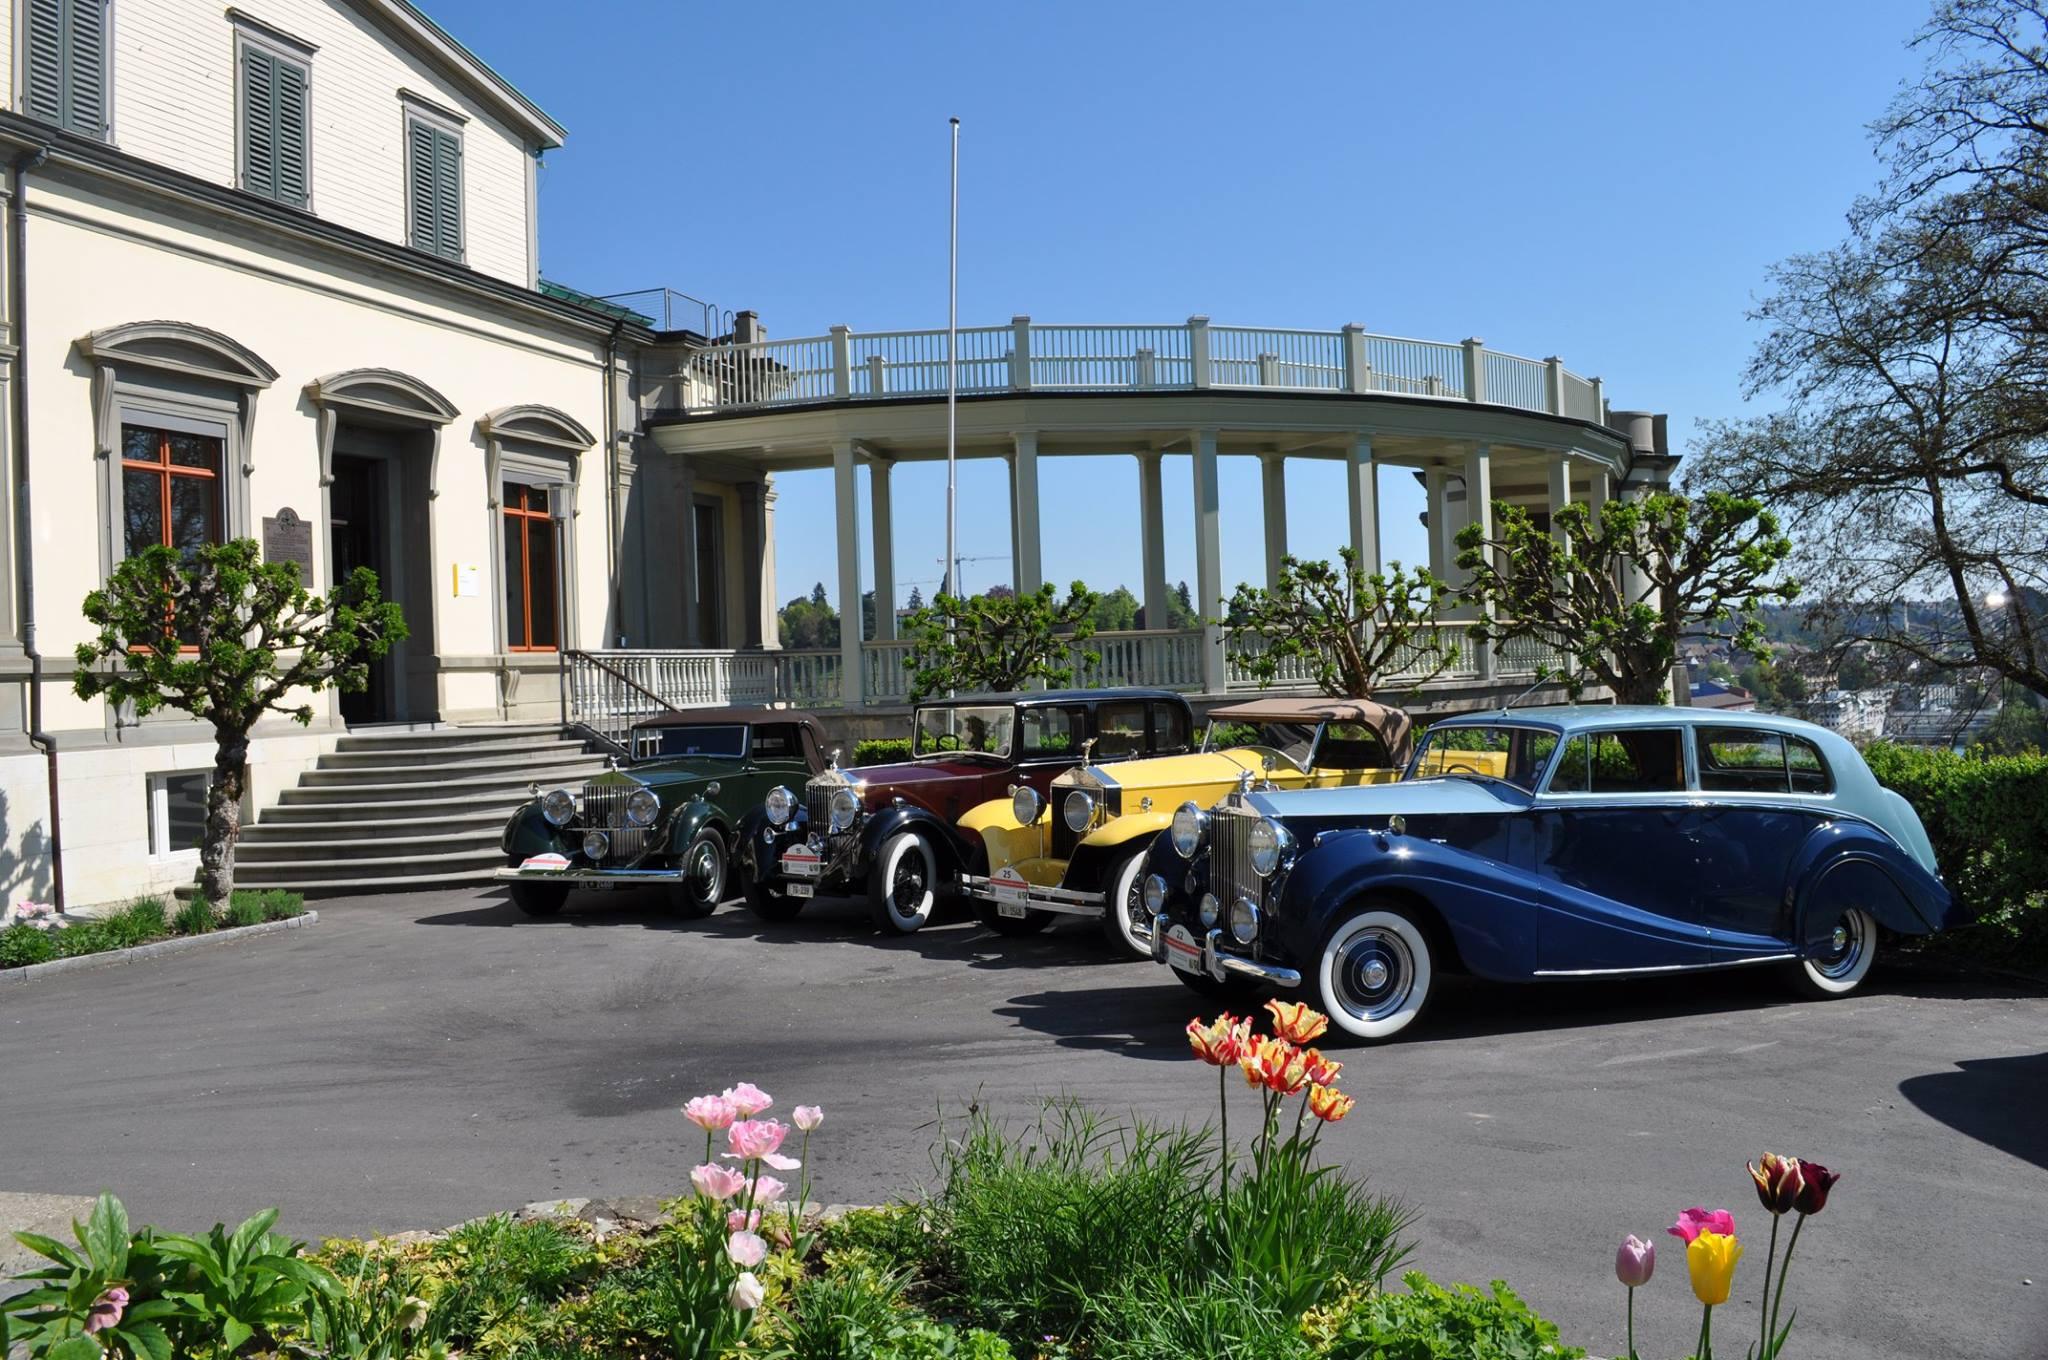 H. Moser & Cie. meets Rolls Royce